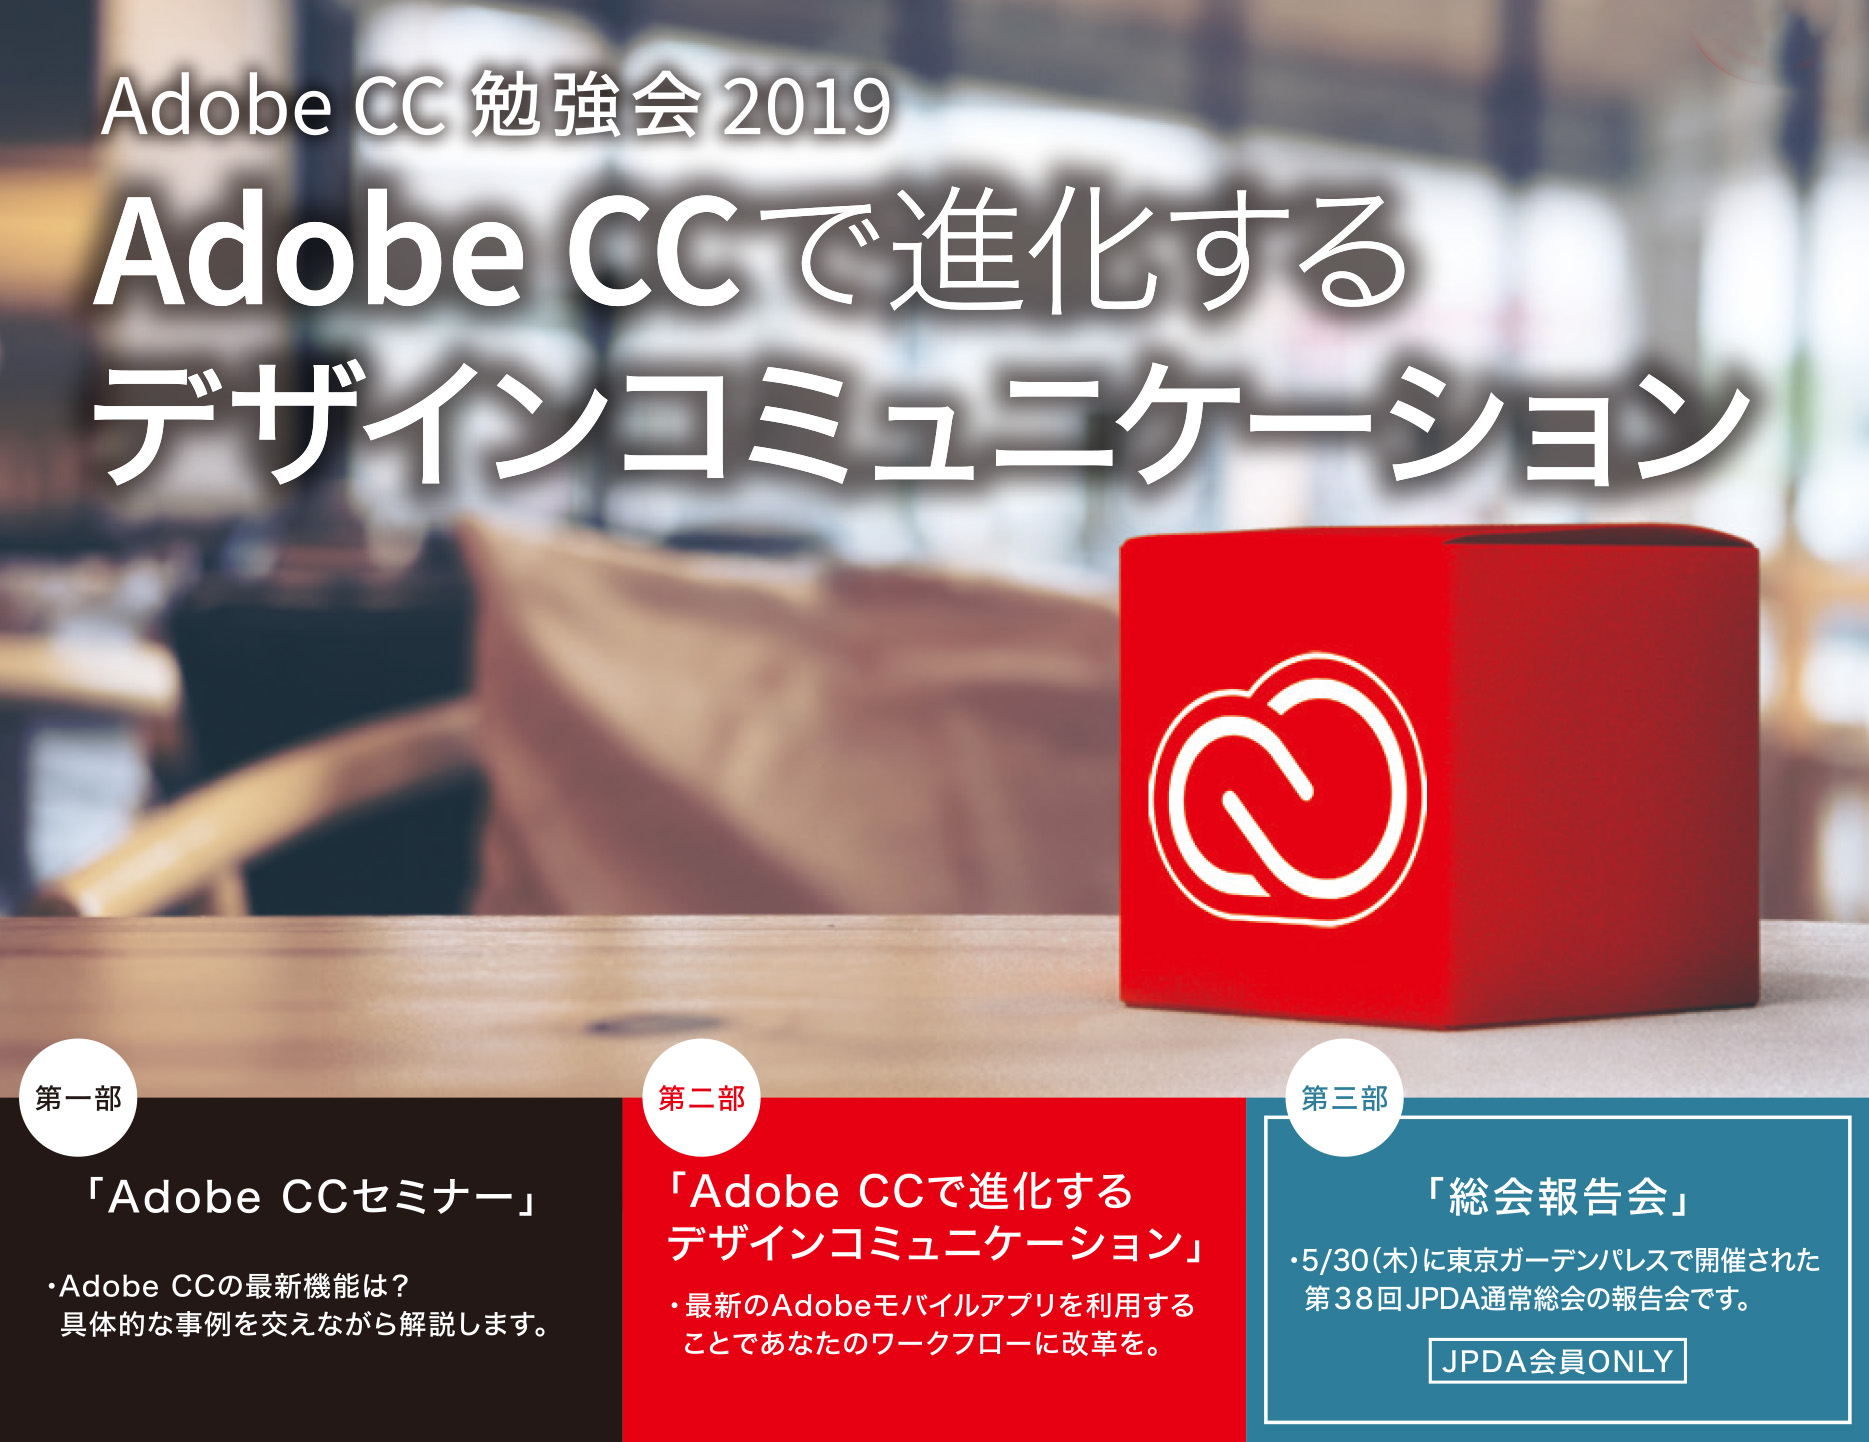 【AdobeCC勉強会 2019】Adobe CCで進化するデザインコミュニケーション/総会報告会のイメージ